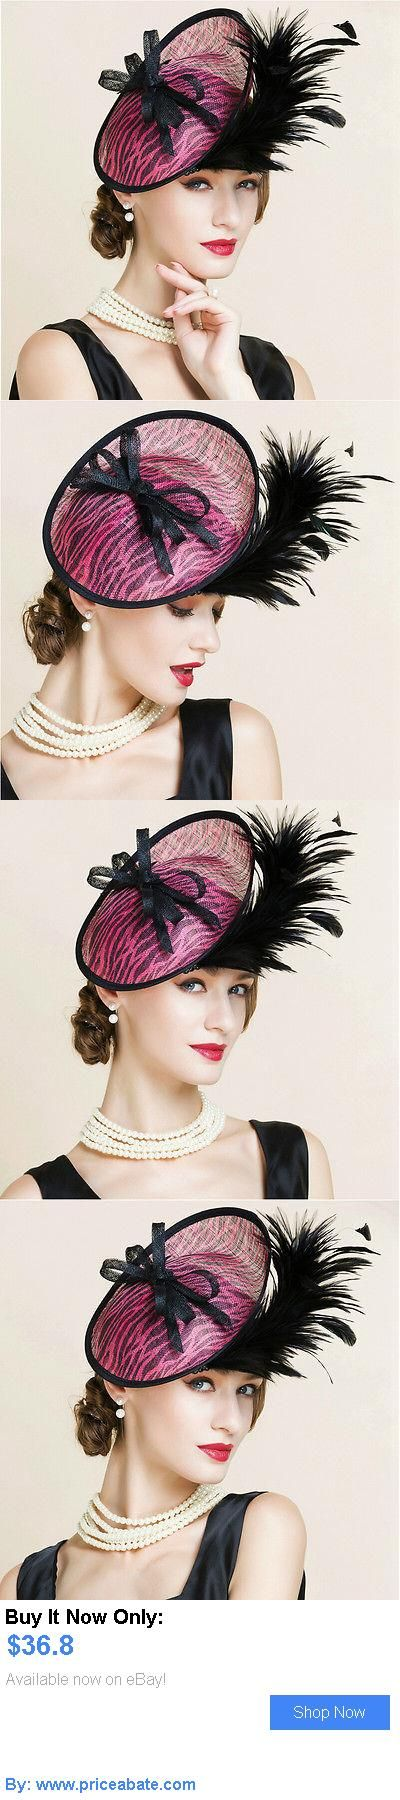 Women Formal Hats: New Womens Linen Hat Kentucky Derby Church Wedding Noble Dress Hat Feather Hat BUY IT NOW ONLY: $36.8 #priceabateWomenFormalHats OR #priceabate